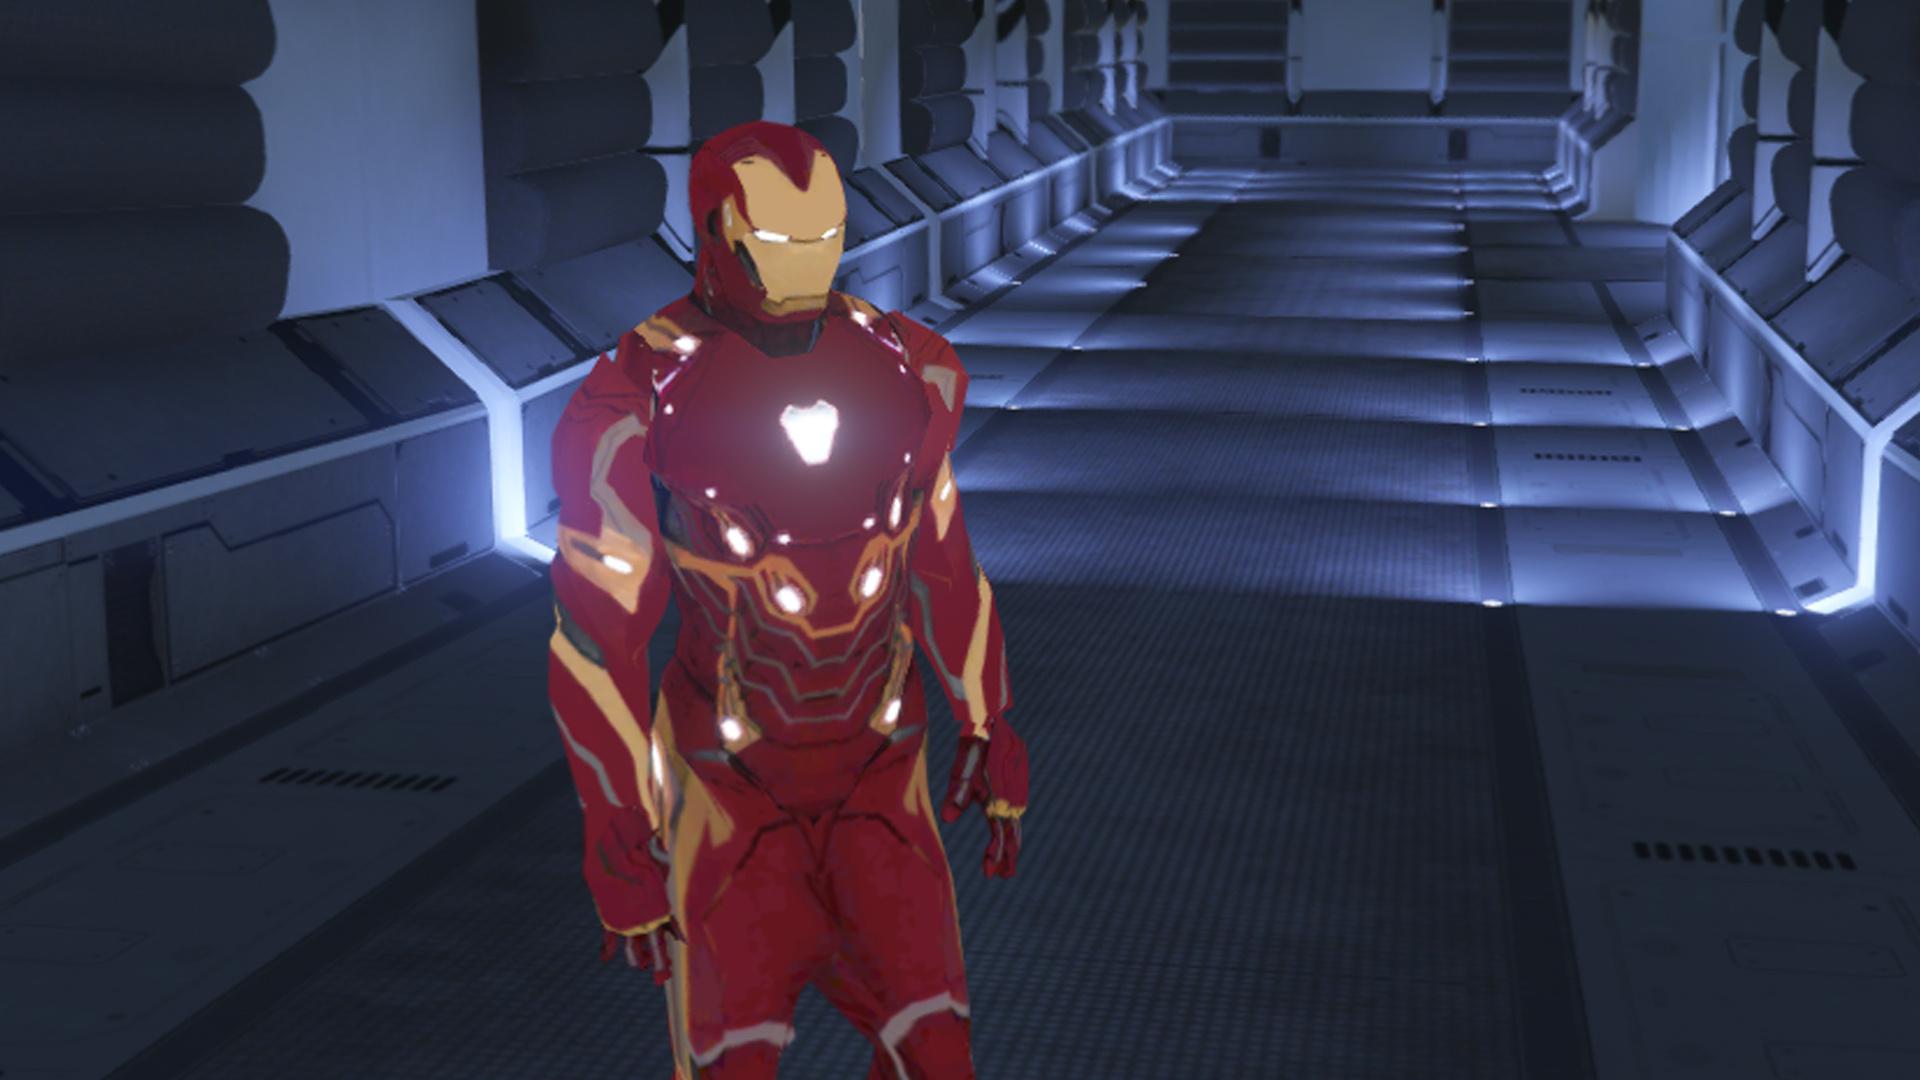 Iron Man Mark 48 (Avengers Infinity War) [Emissive] - GTA5 ...